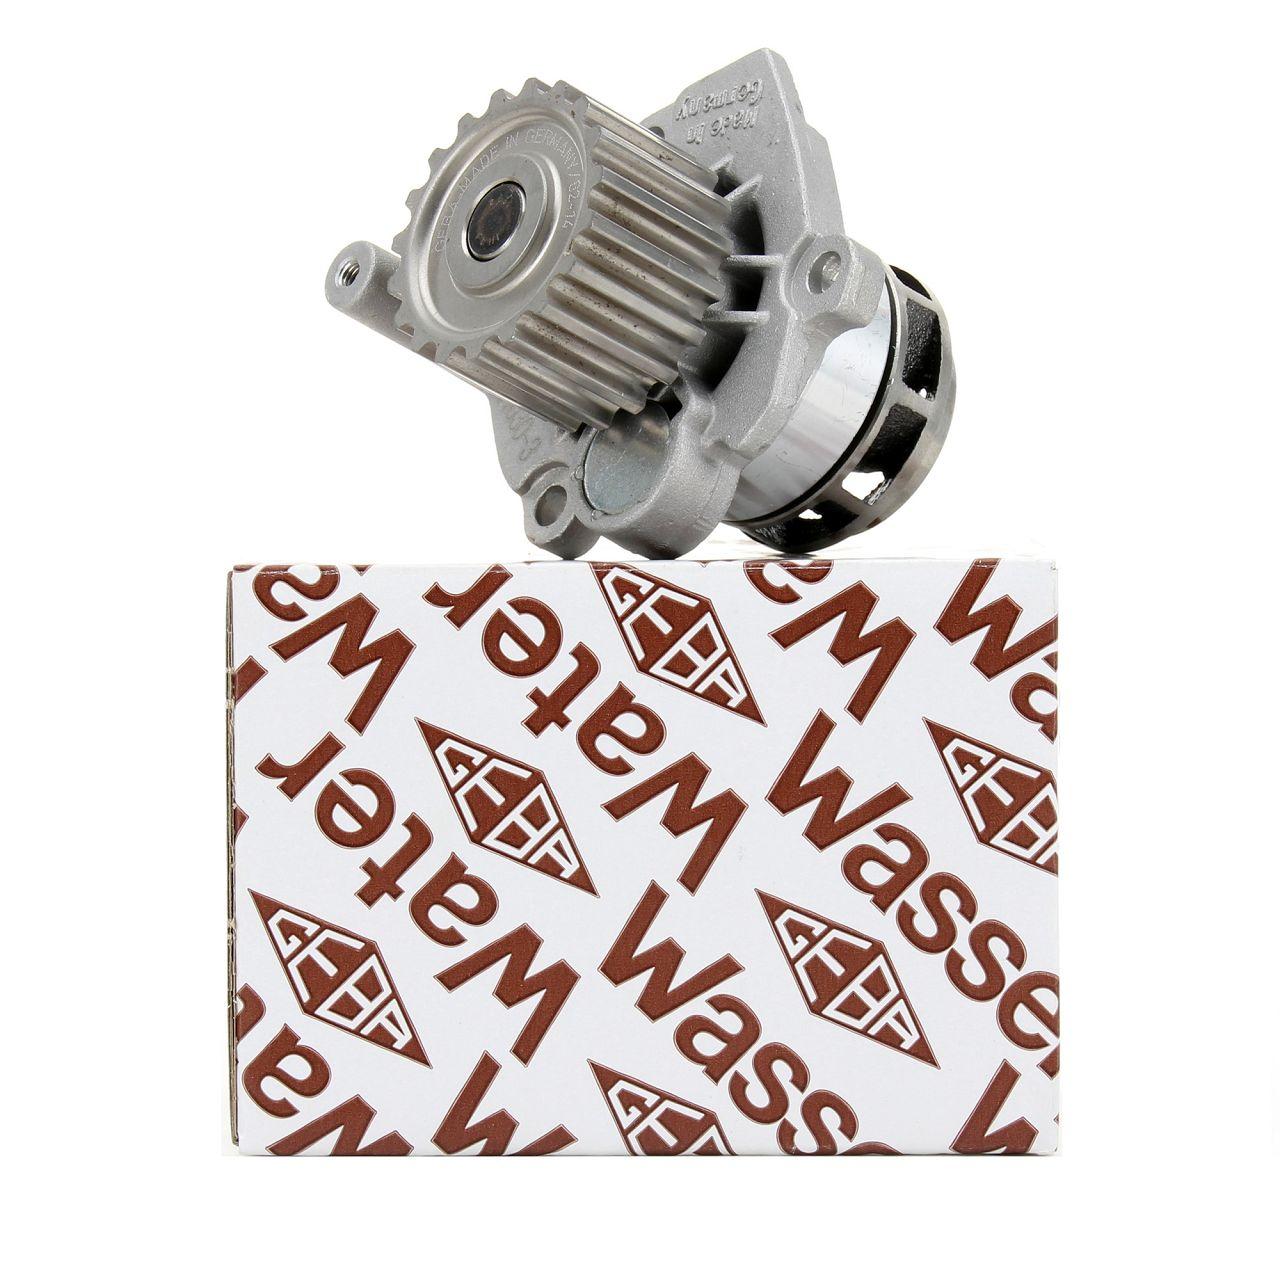 GEBA Wasserpumpe Kühlwasserpumpe für VW AUDI SEAT SKODA 1.4 1.9 TDI 045121011HX